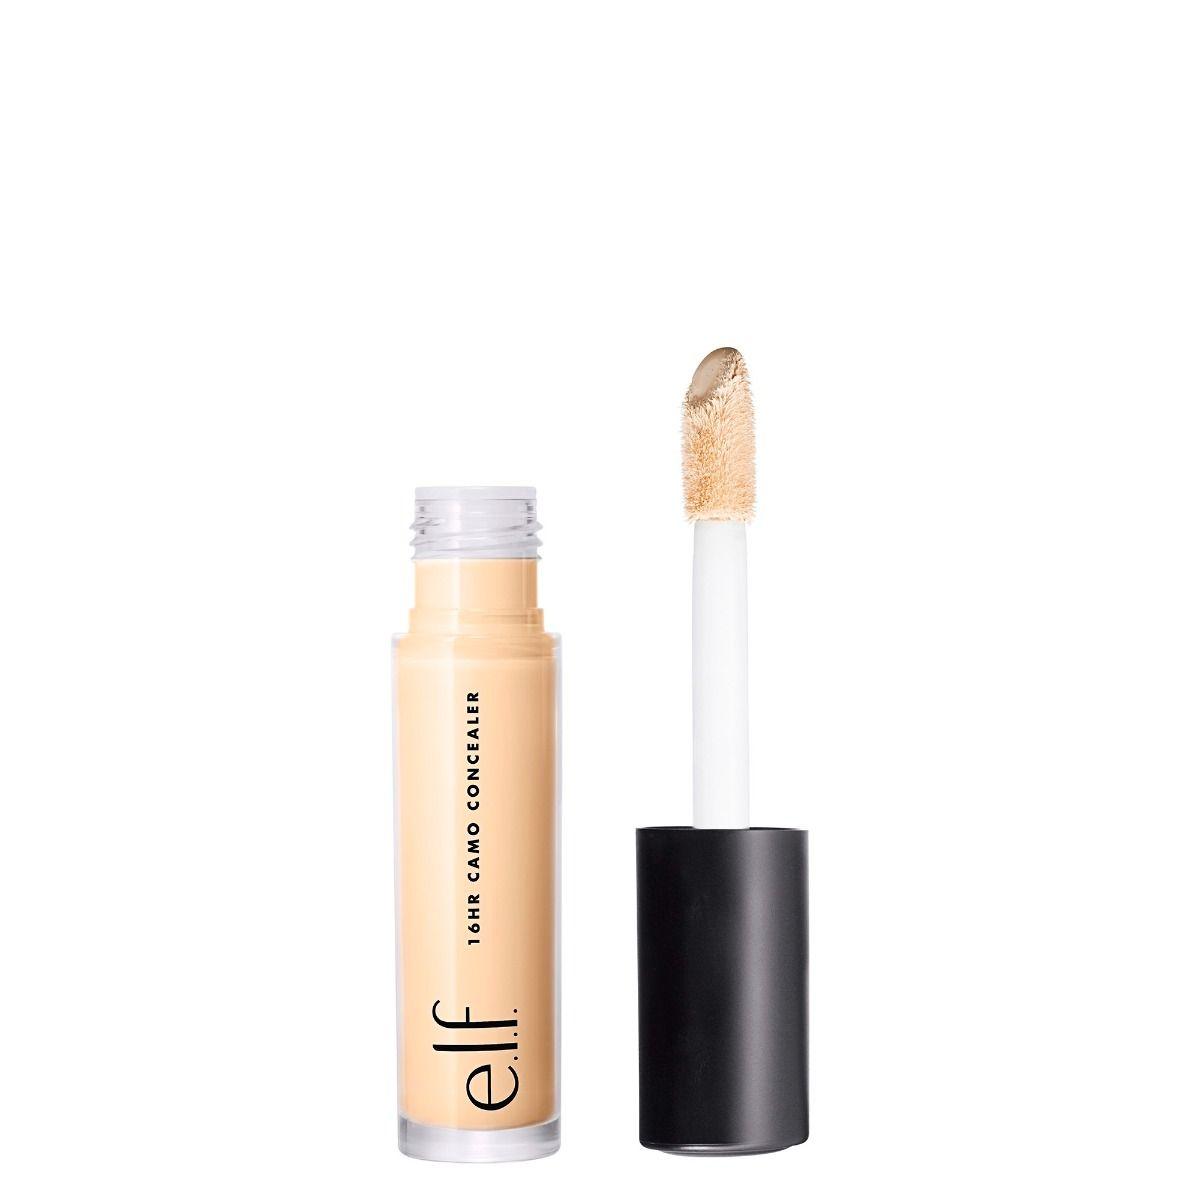 e.l.f. Cosmetics 16HR Camo Concealer Light Sand 6ml